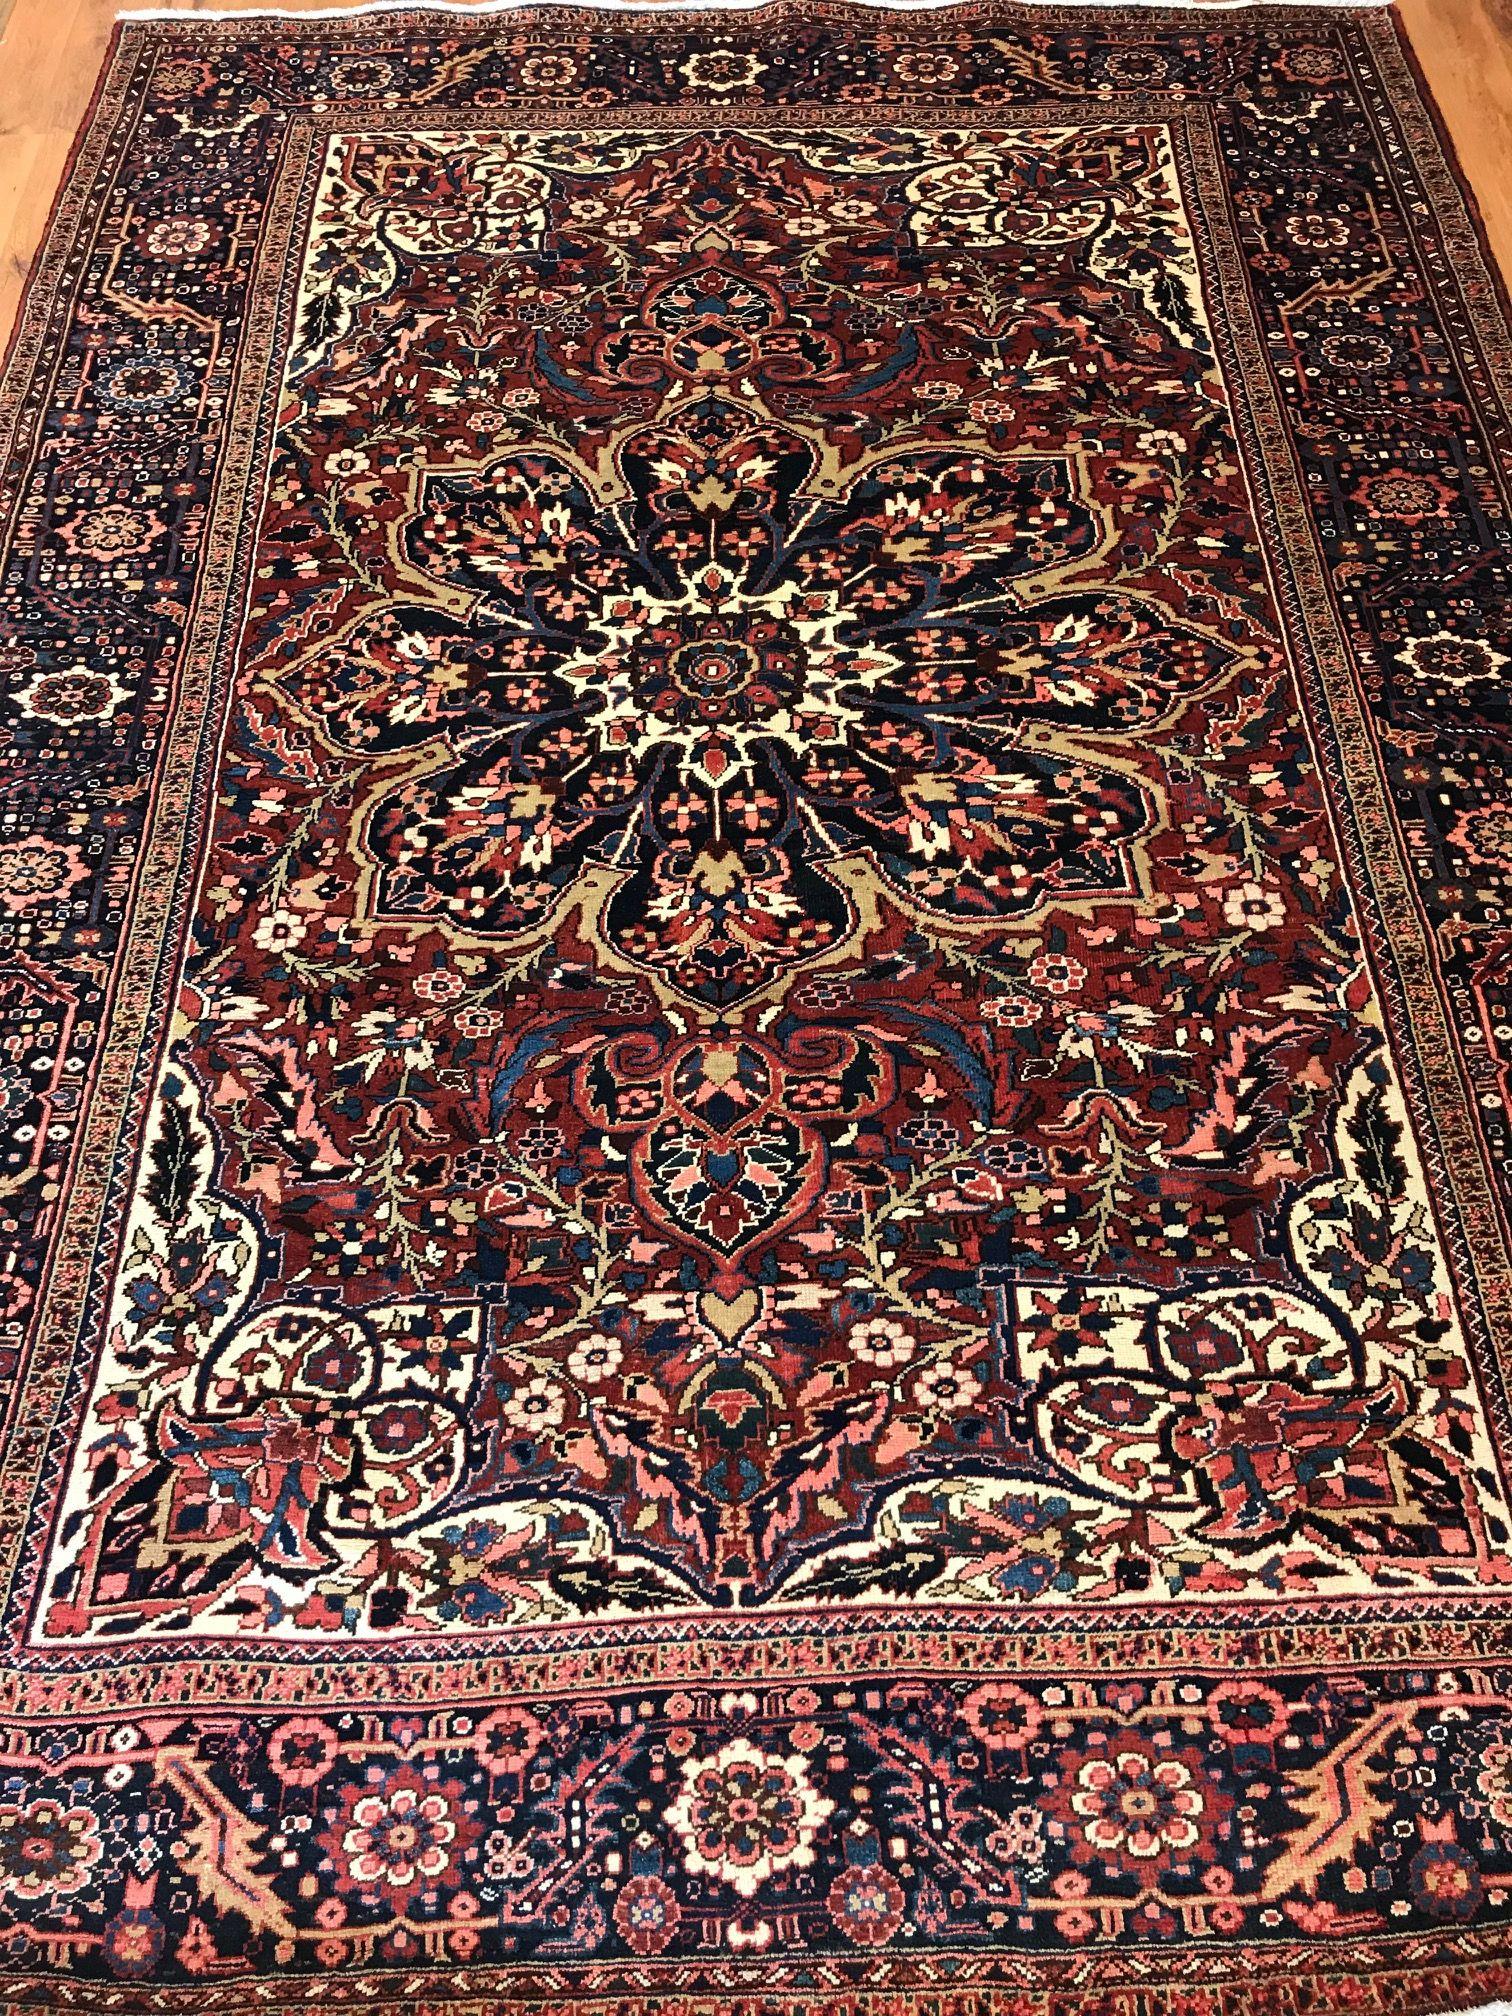 Persian Heriz Area Rug Made Of Wool